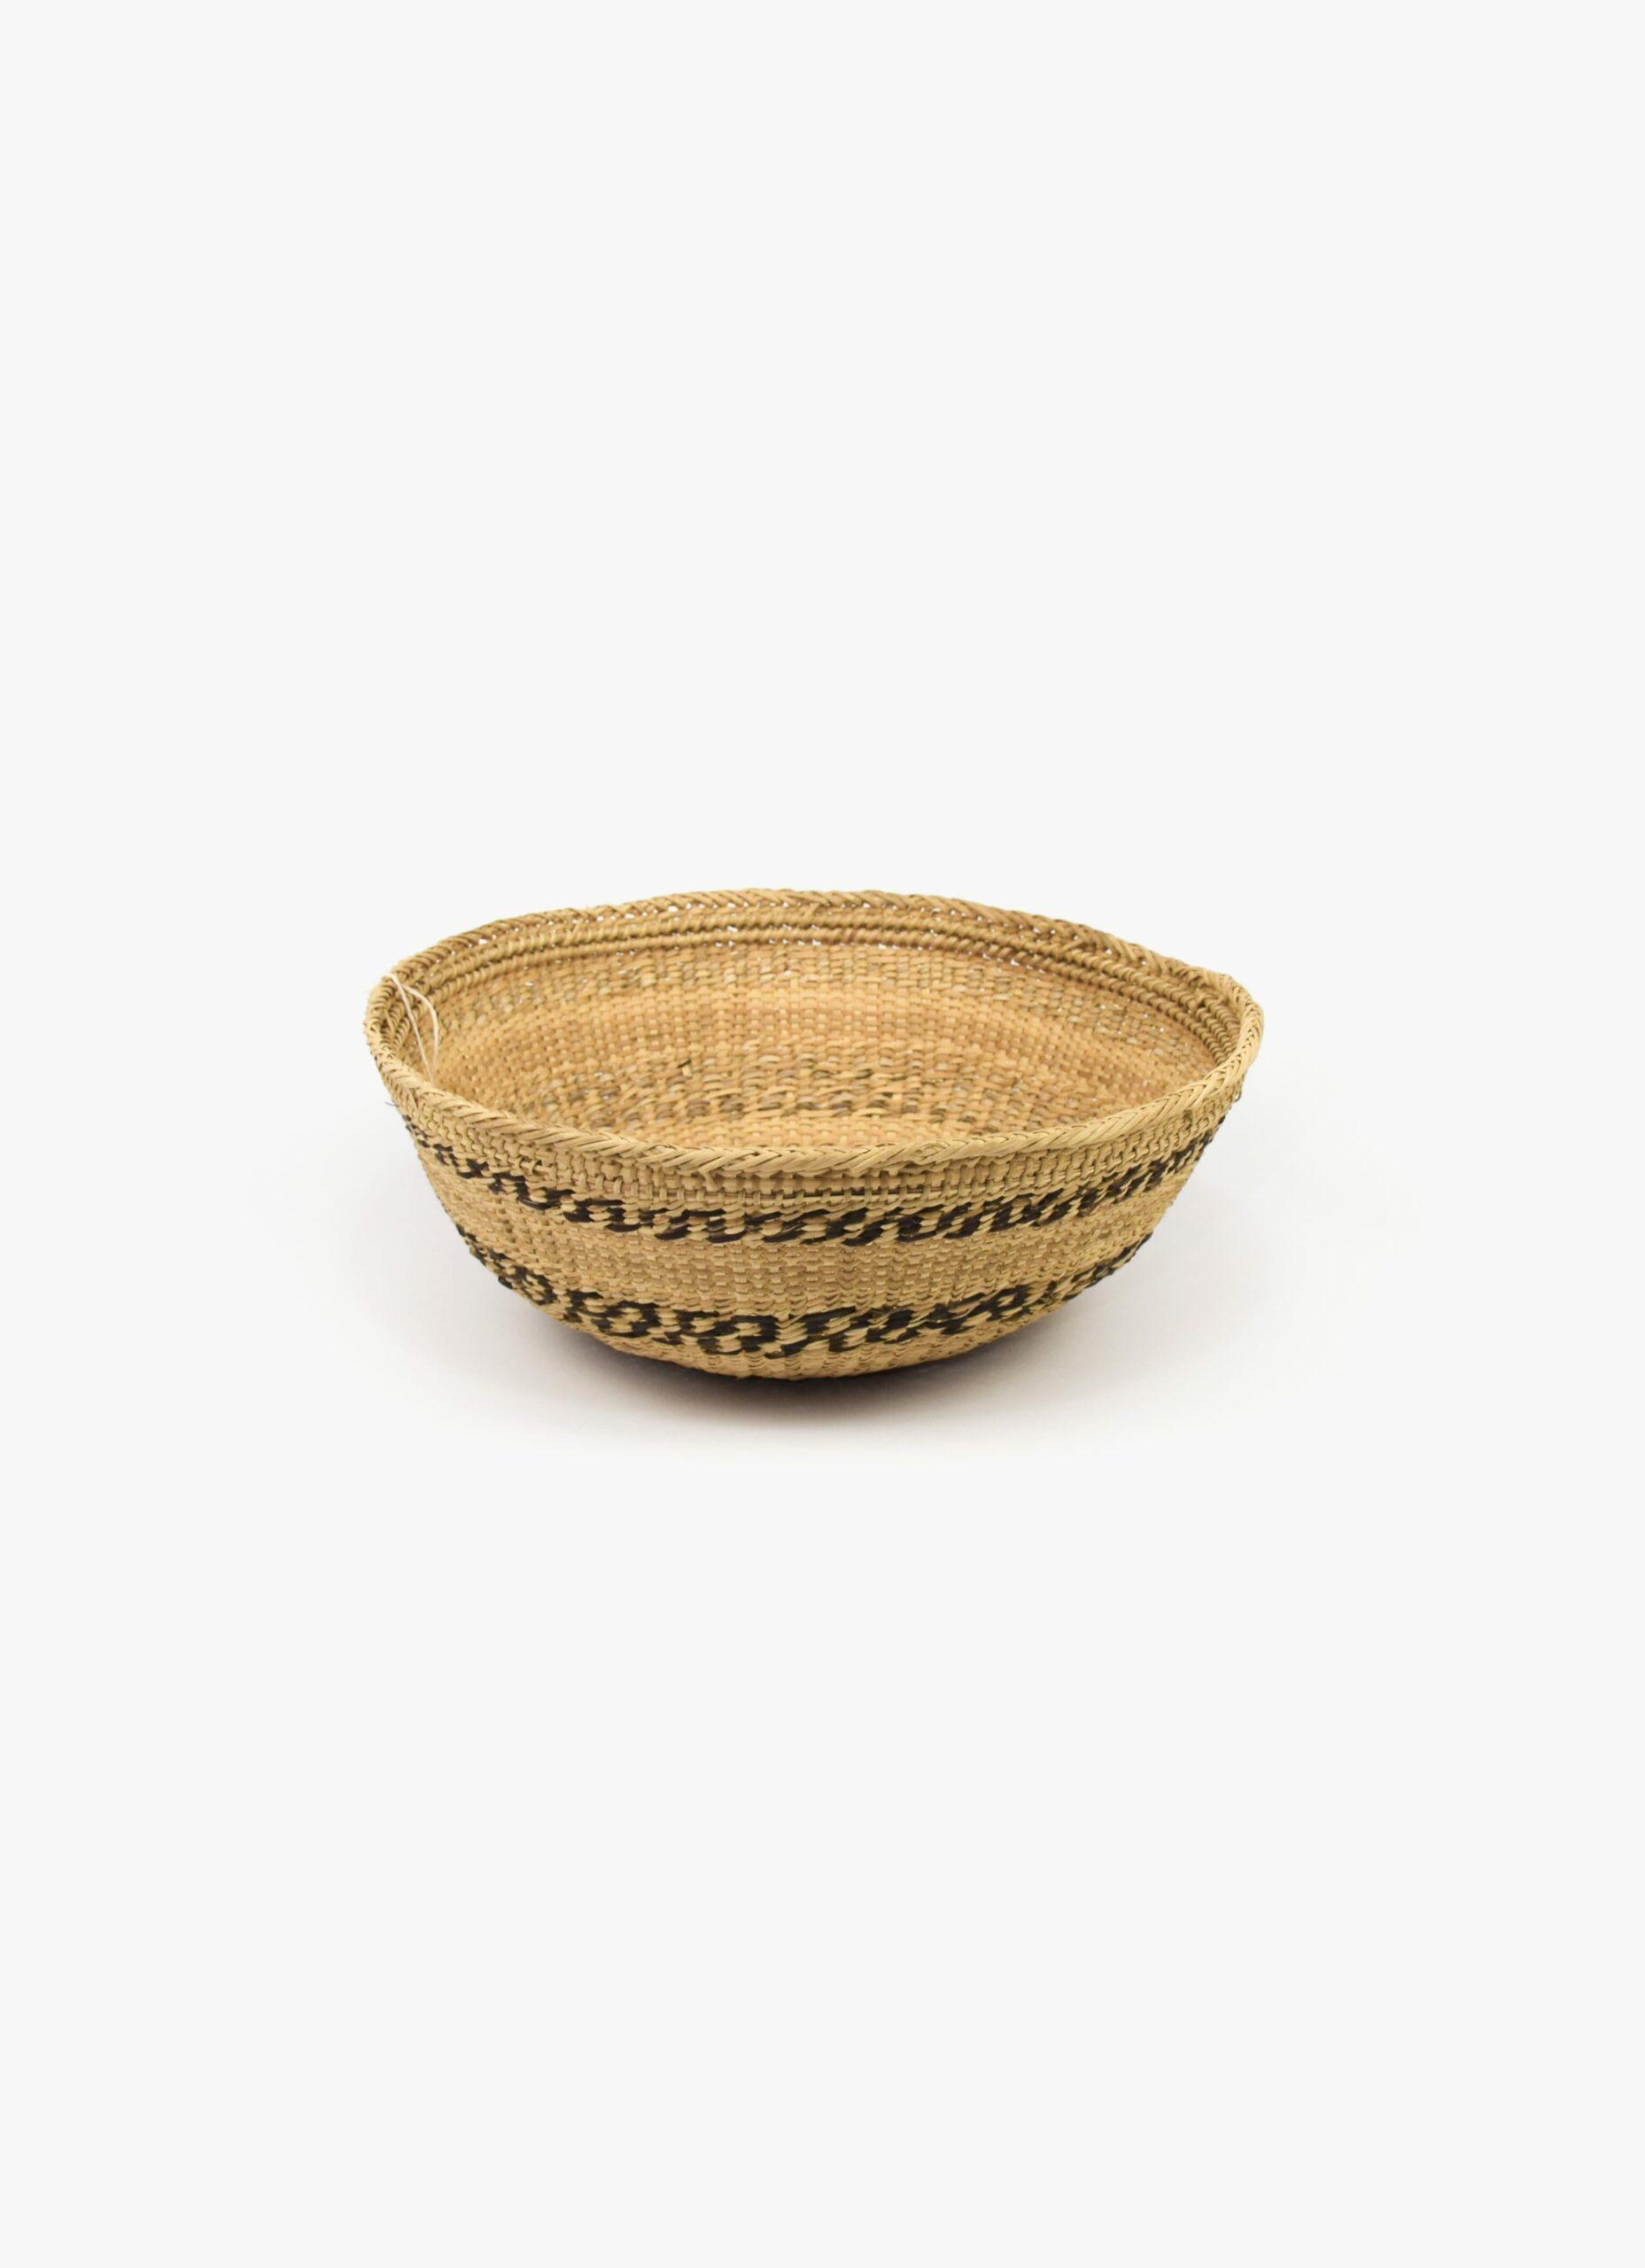 Incausa - Xotehe Basket by Yanomami People - 13x38cm